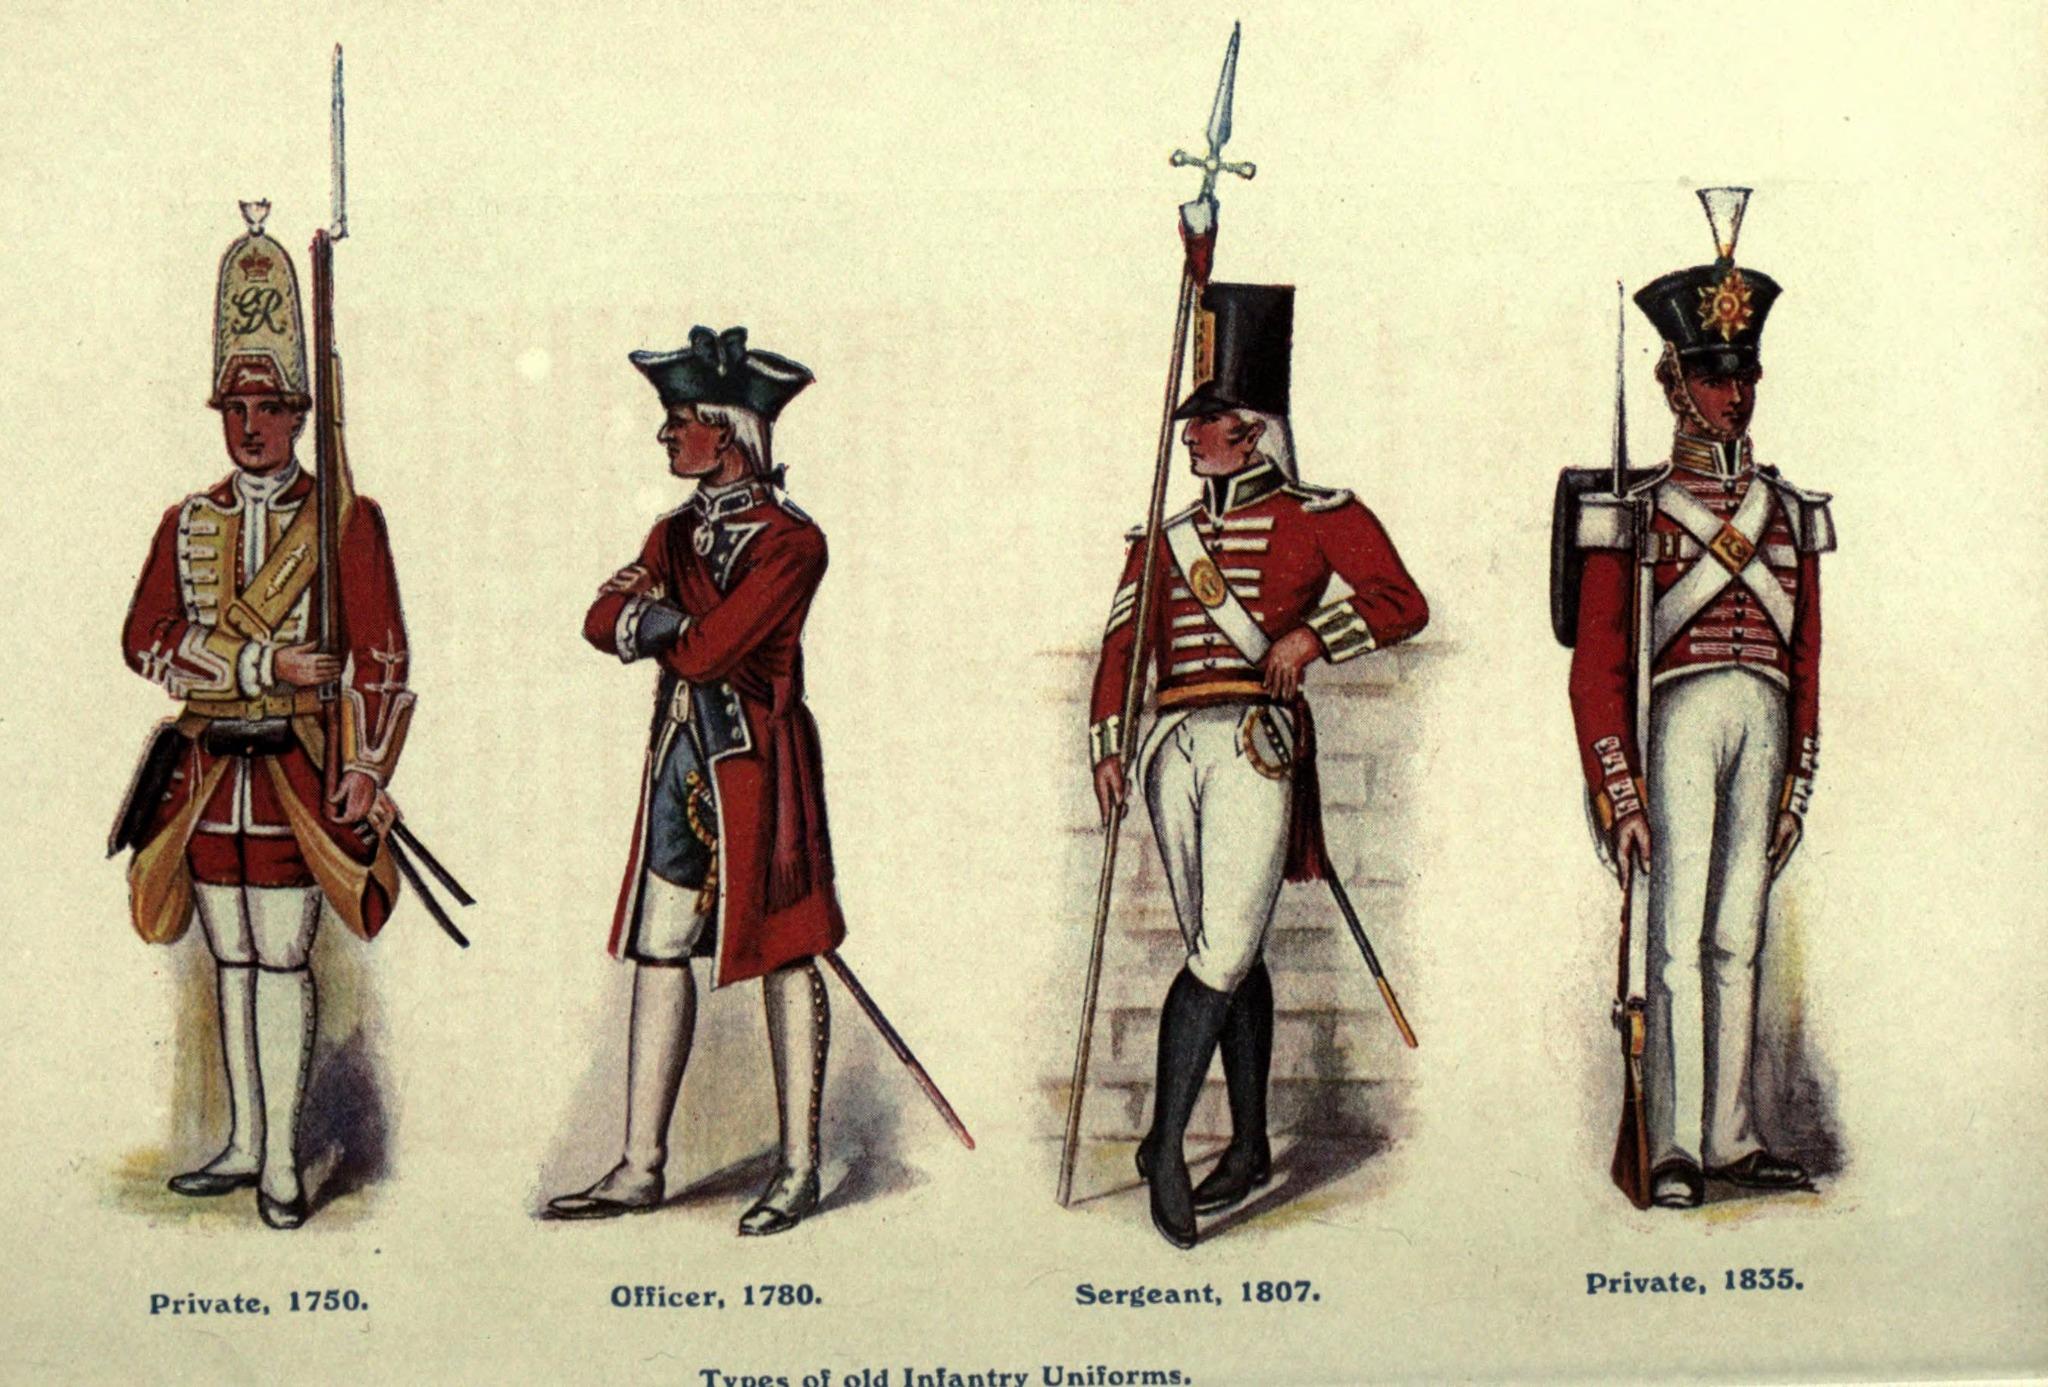 British_old_infantry_uniforms.jpg